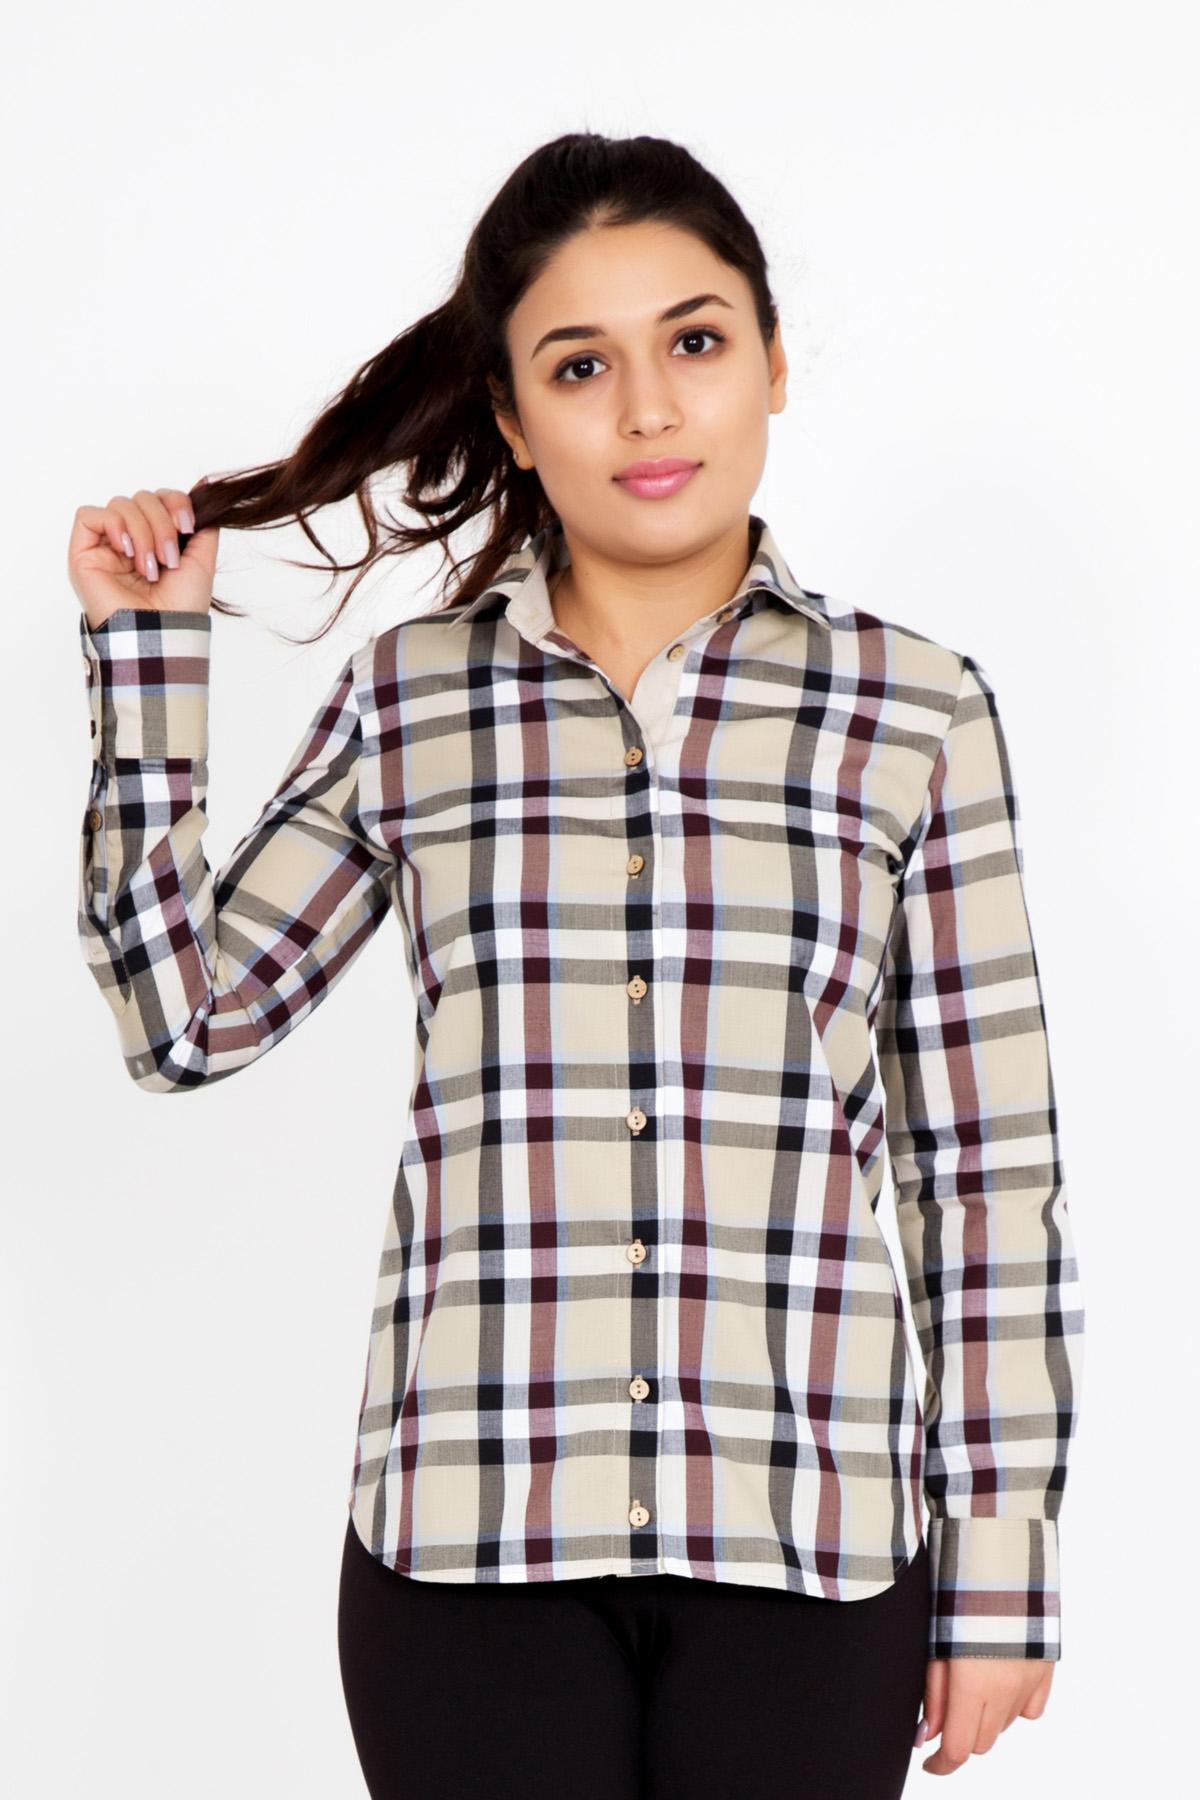 Жен. рубашка  Нидия  Бежевый р. 42 - Женская одежда артикул: 23511